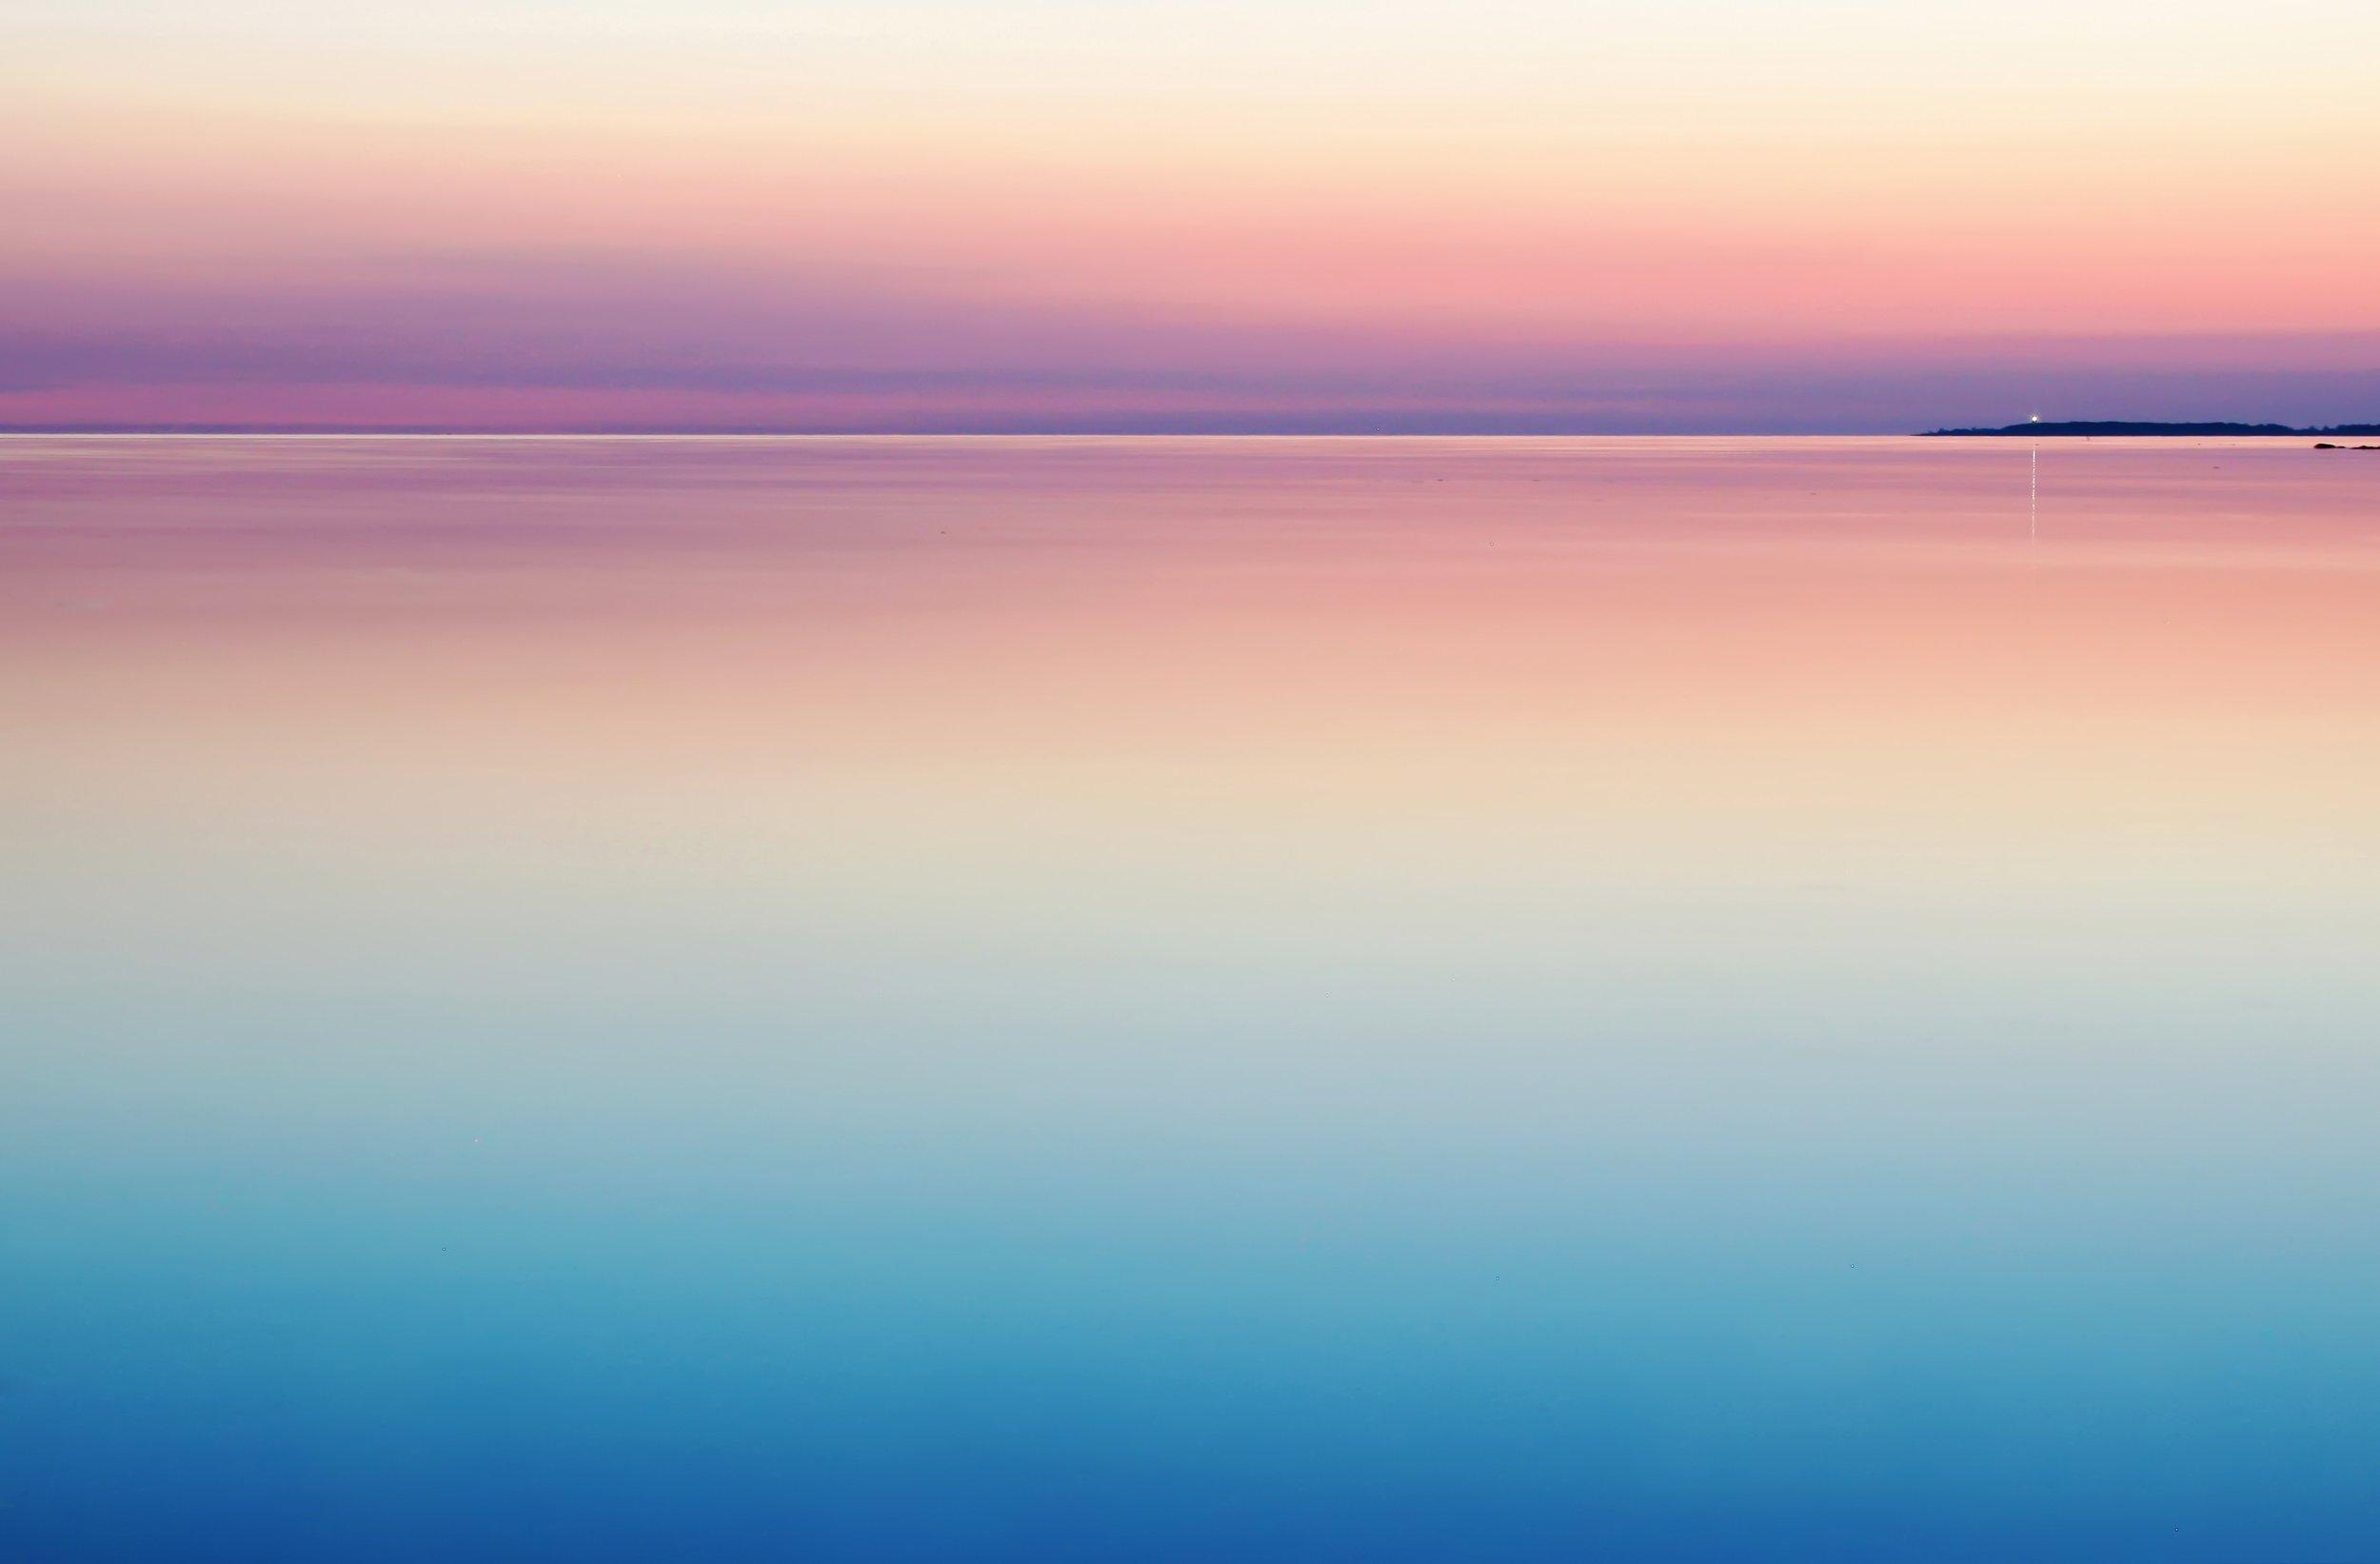 Serenity - Unsplash - Harli Marten 140106.jpg